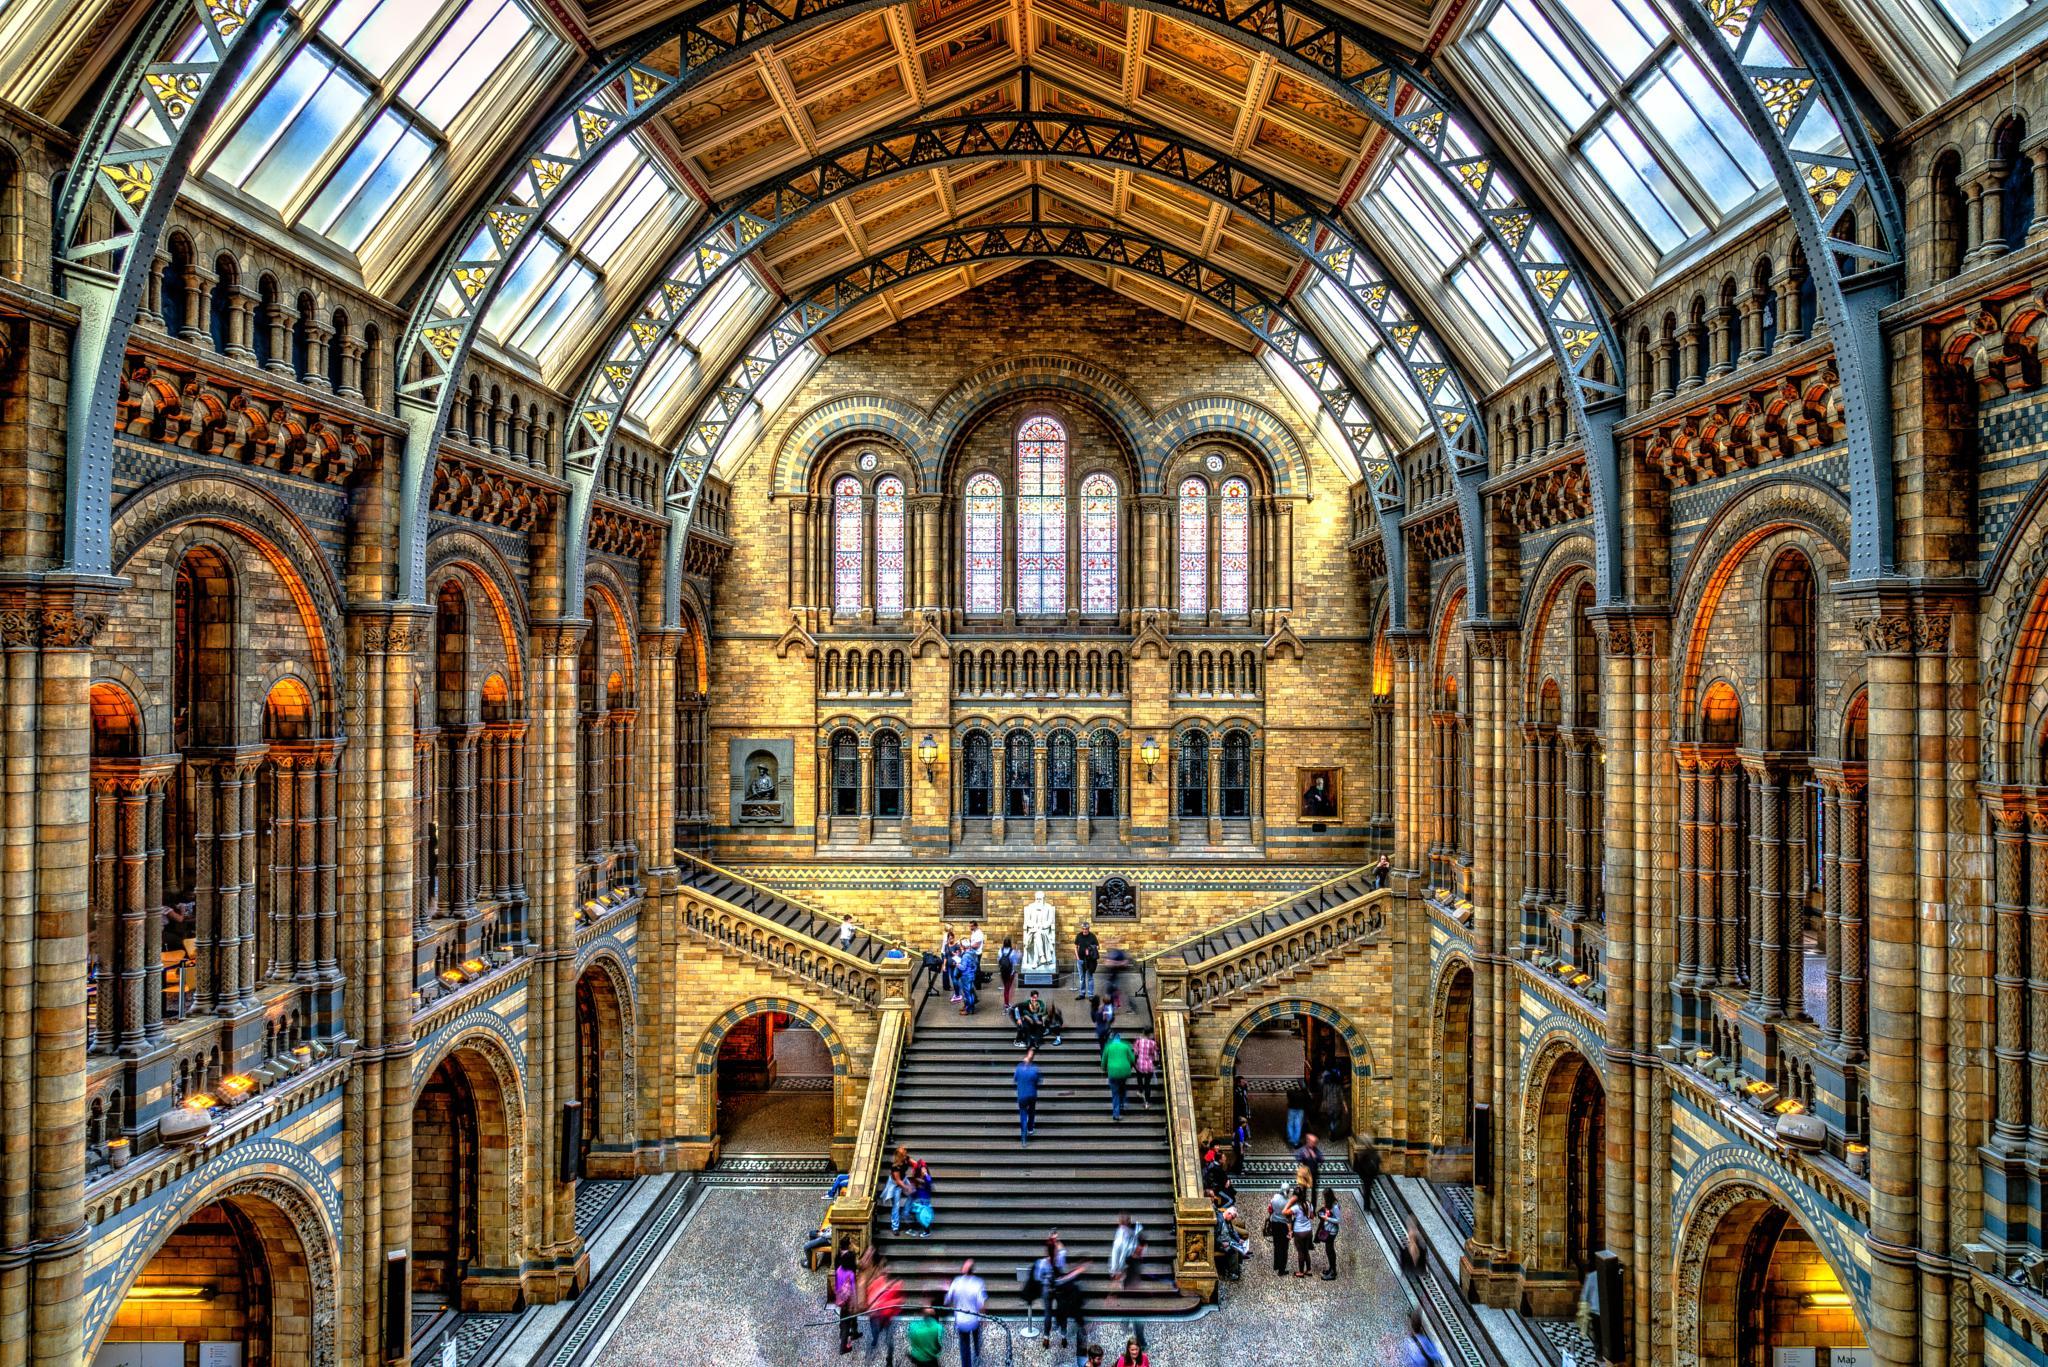 London - Natural History Museum by Lukas Proszowski